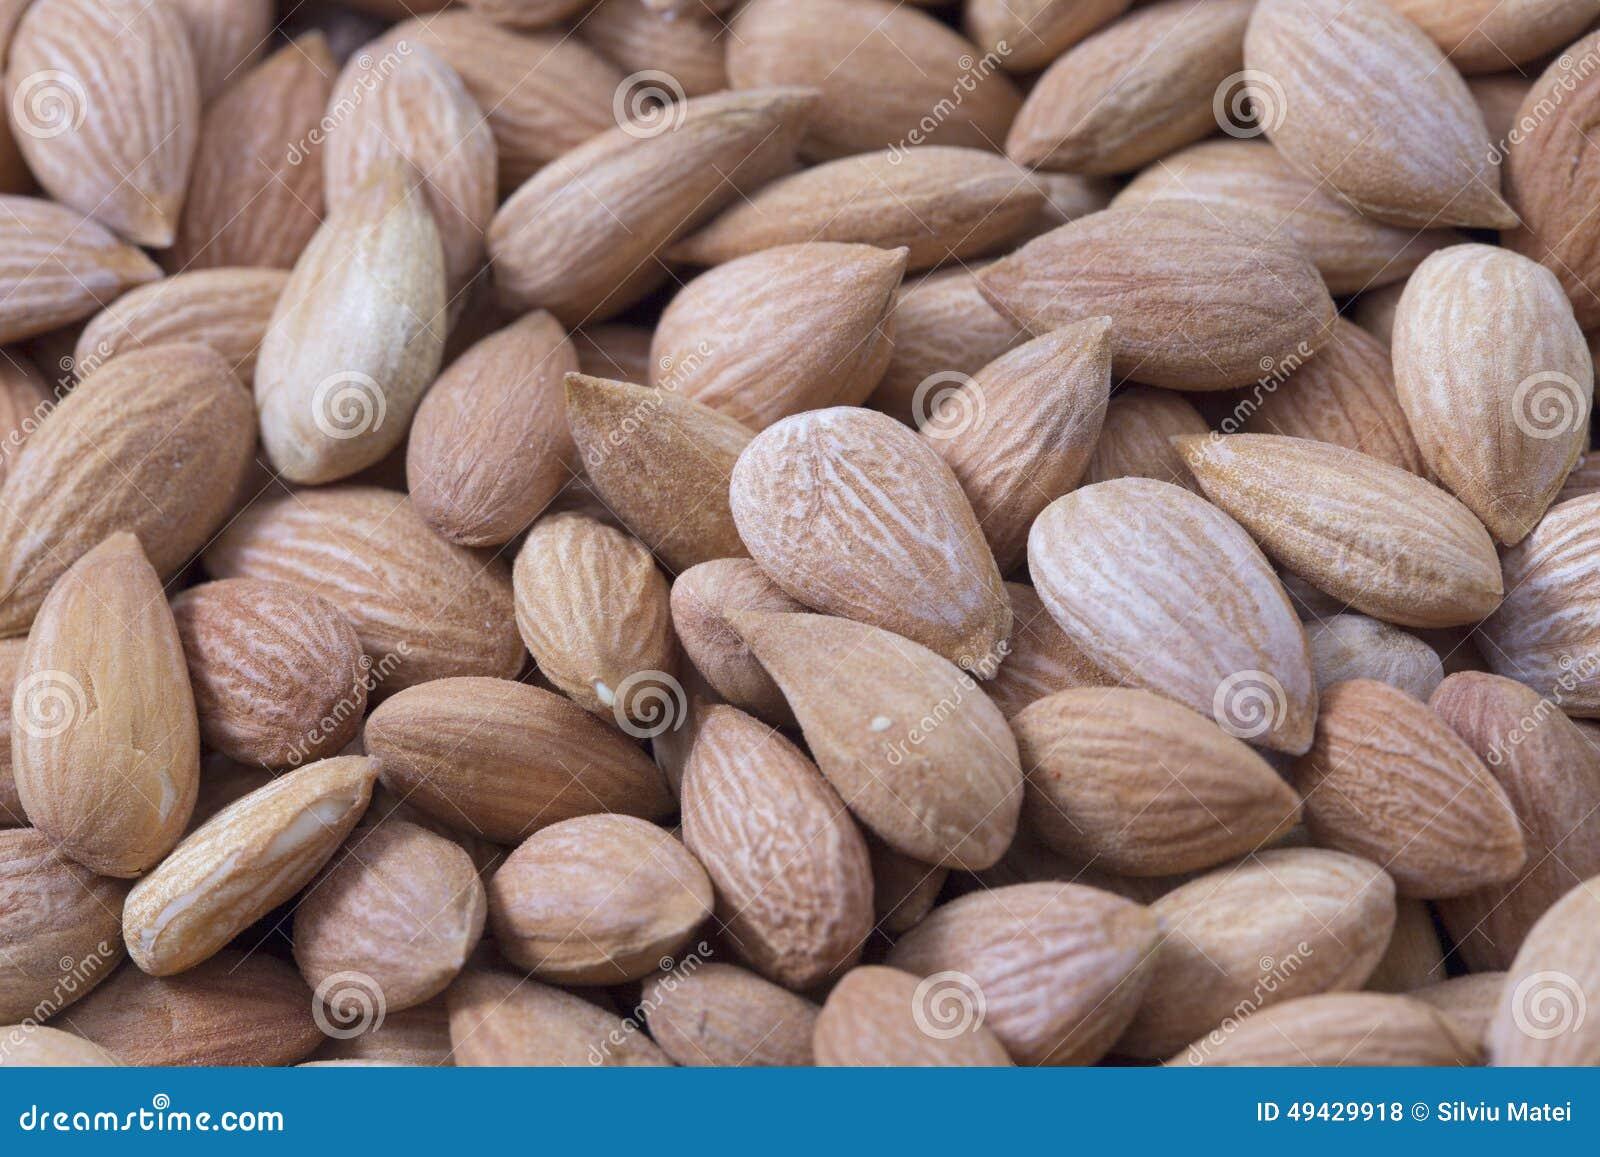 Apricot kernel